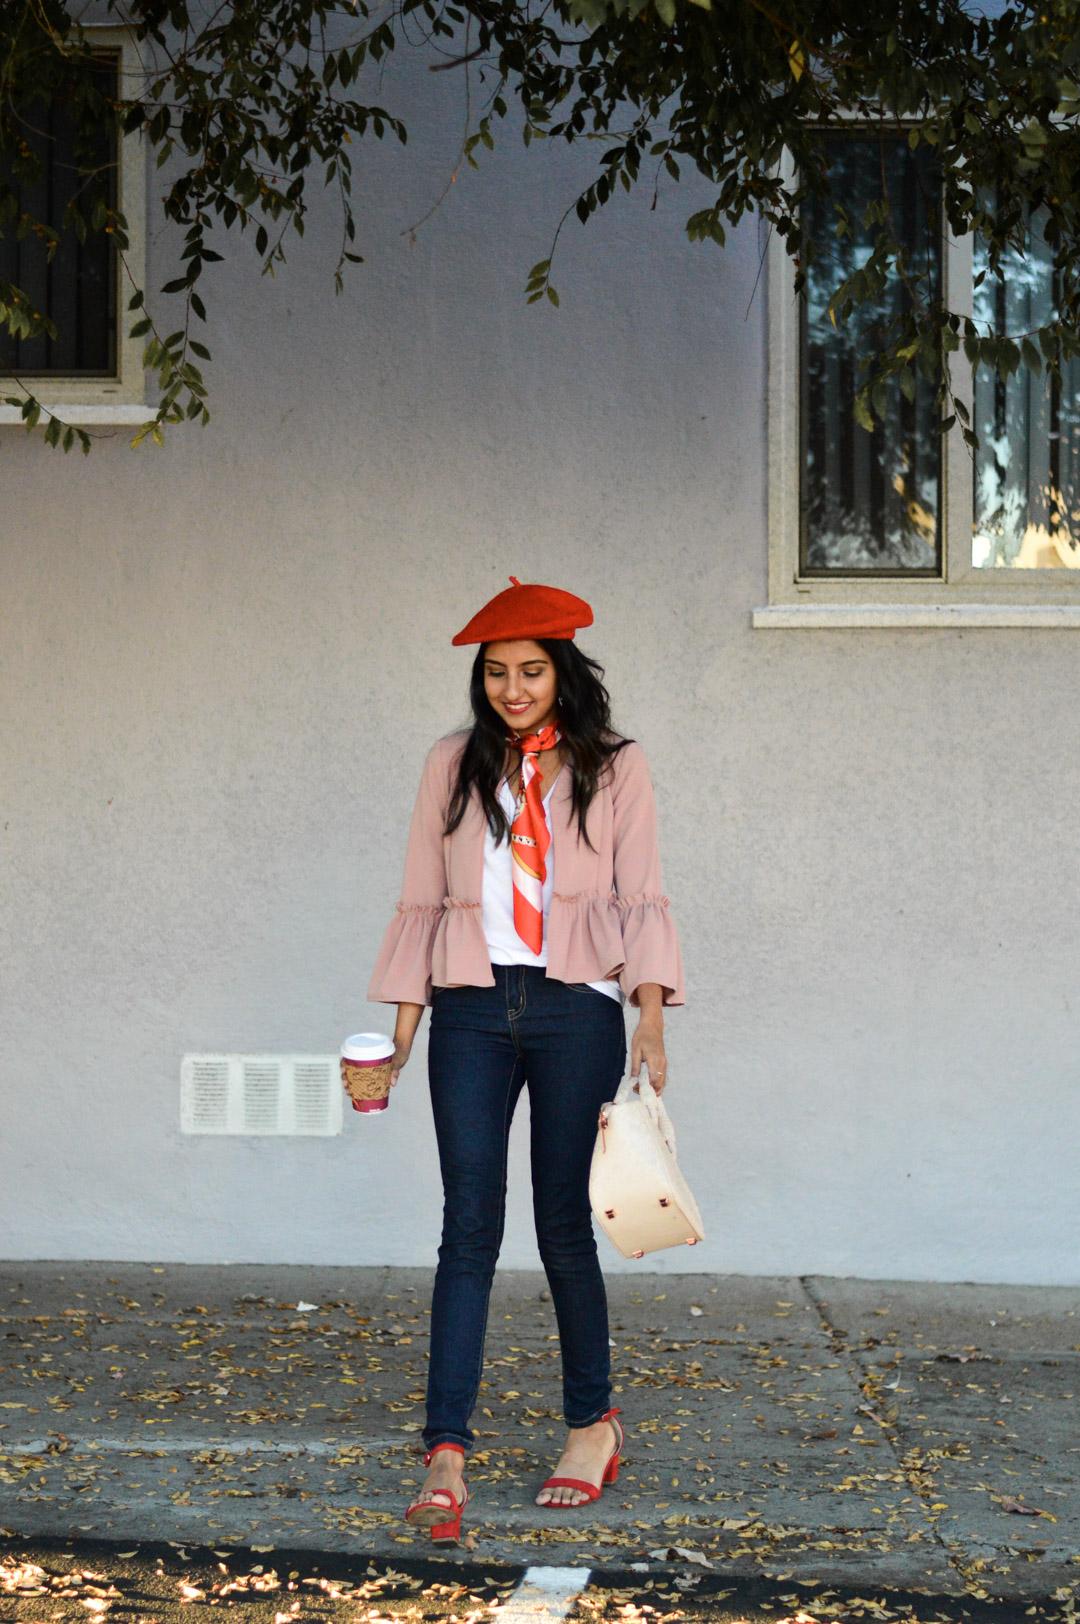 parisian-chic-beret-ruffles-blogger-outfit 1